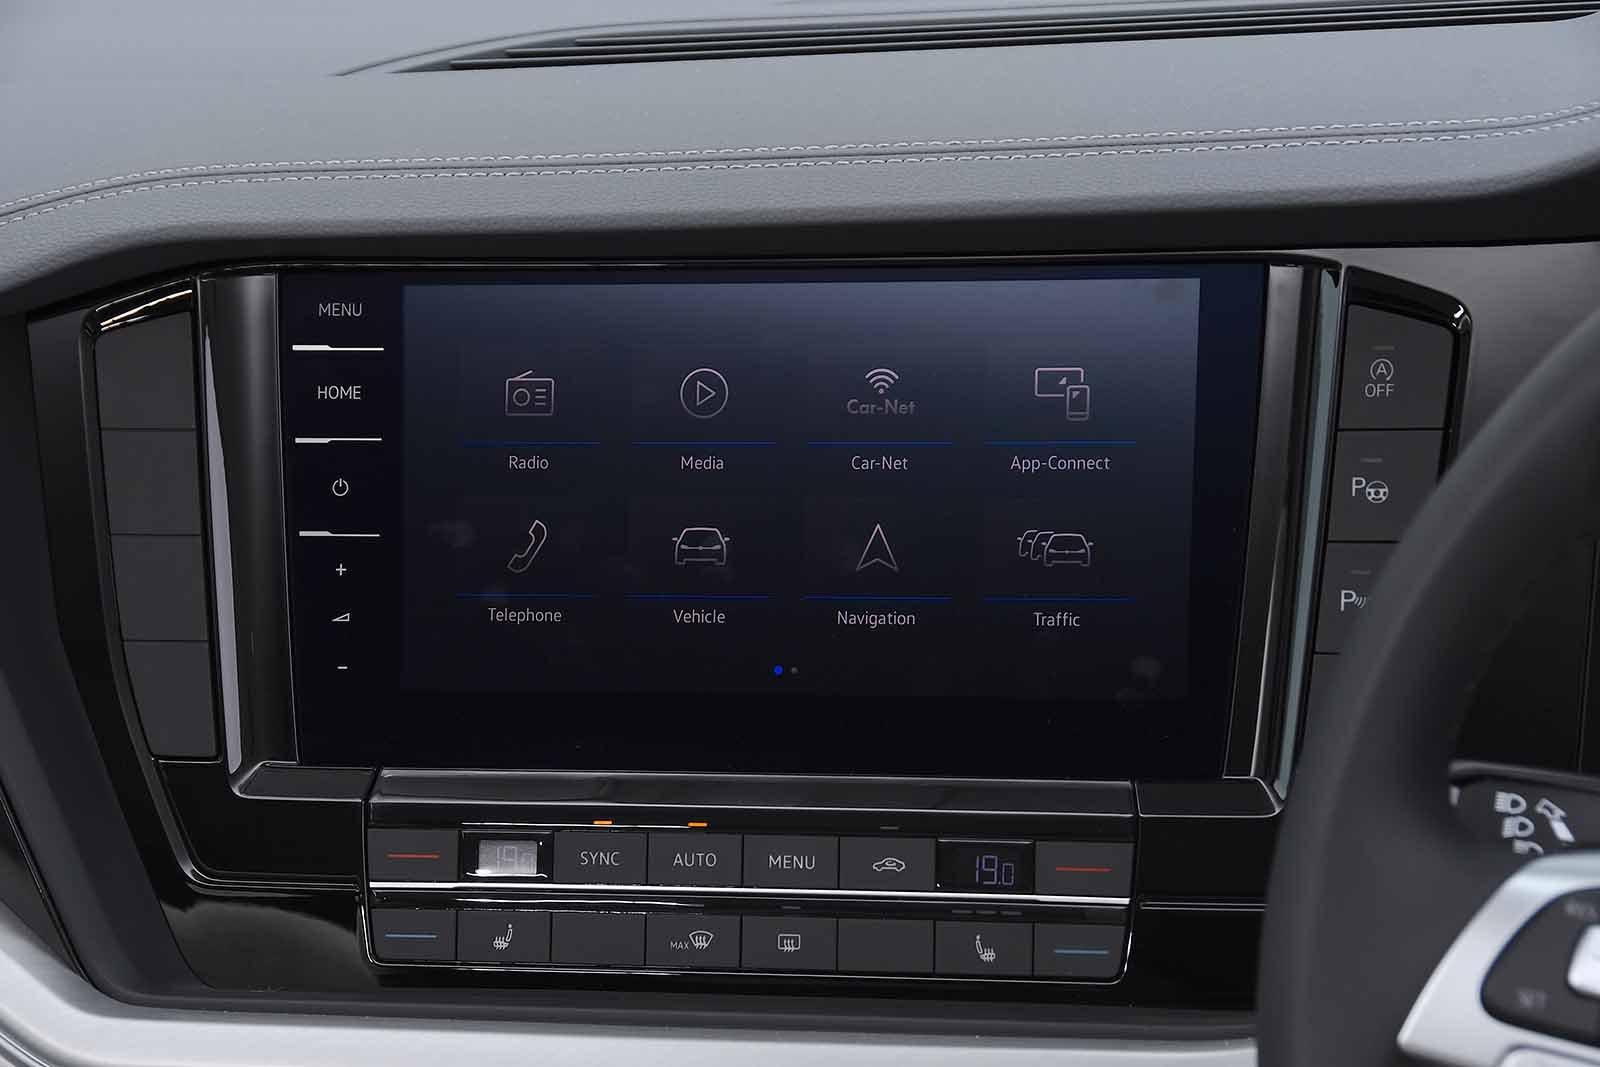 Volkswagen Touareg 2021 RHD infotainment